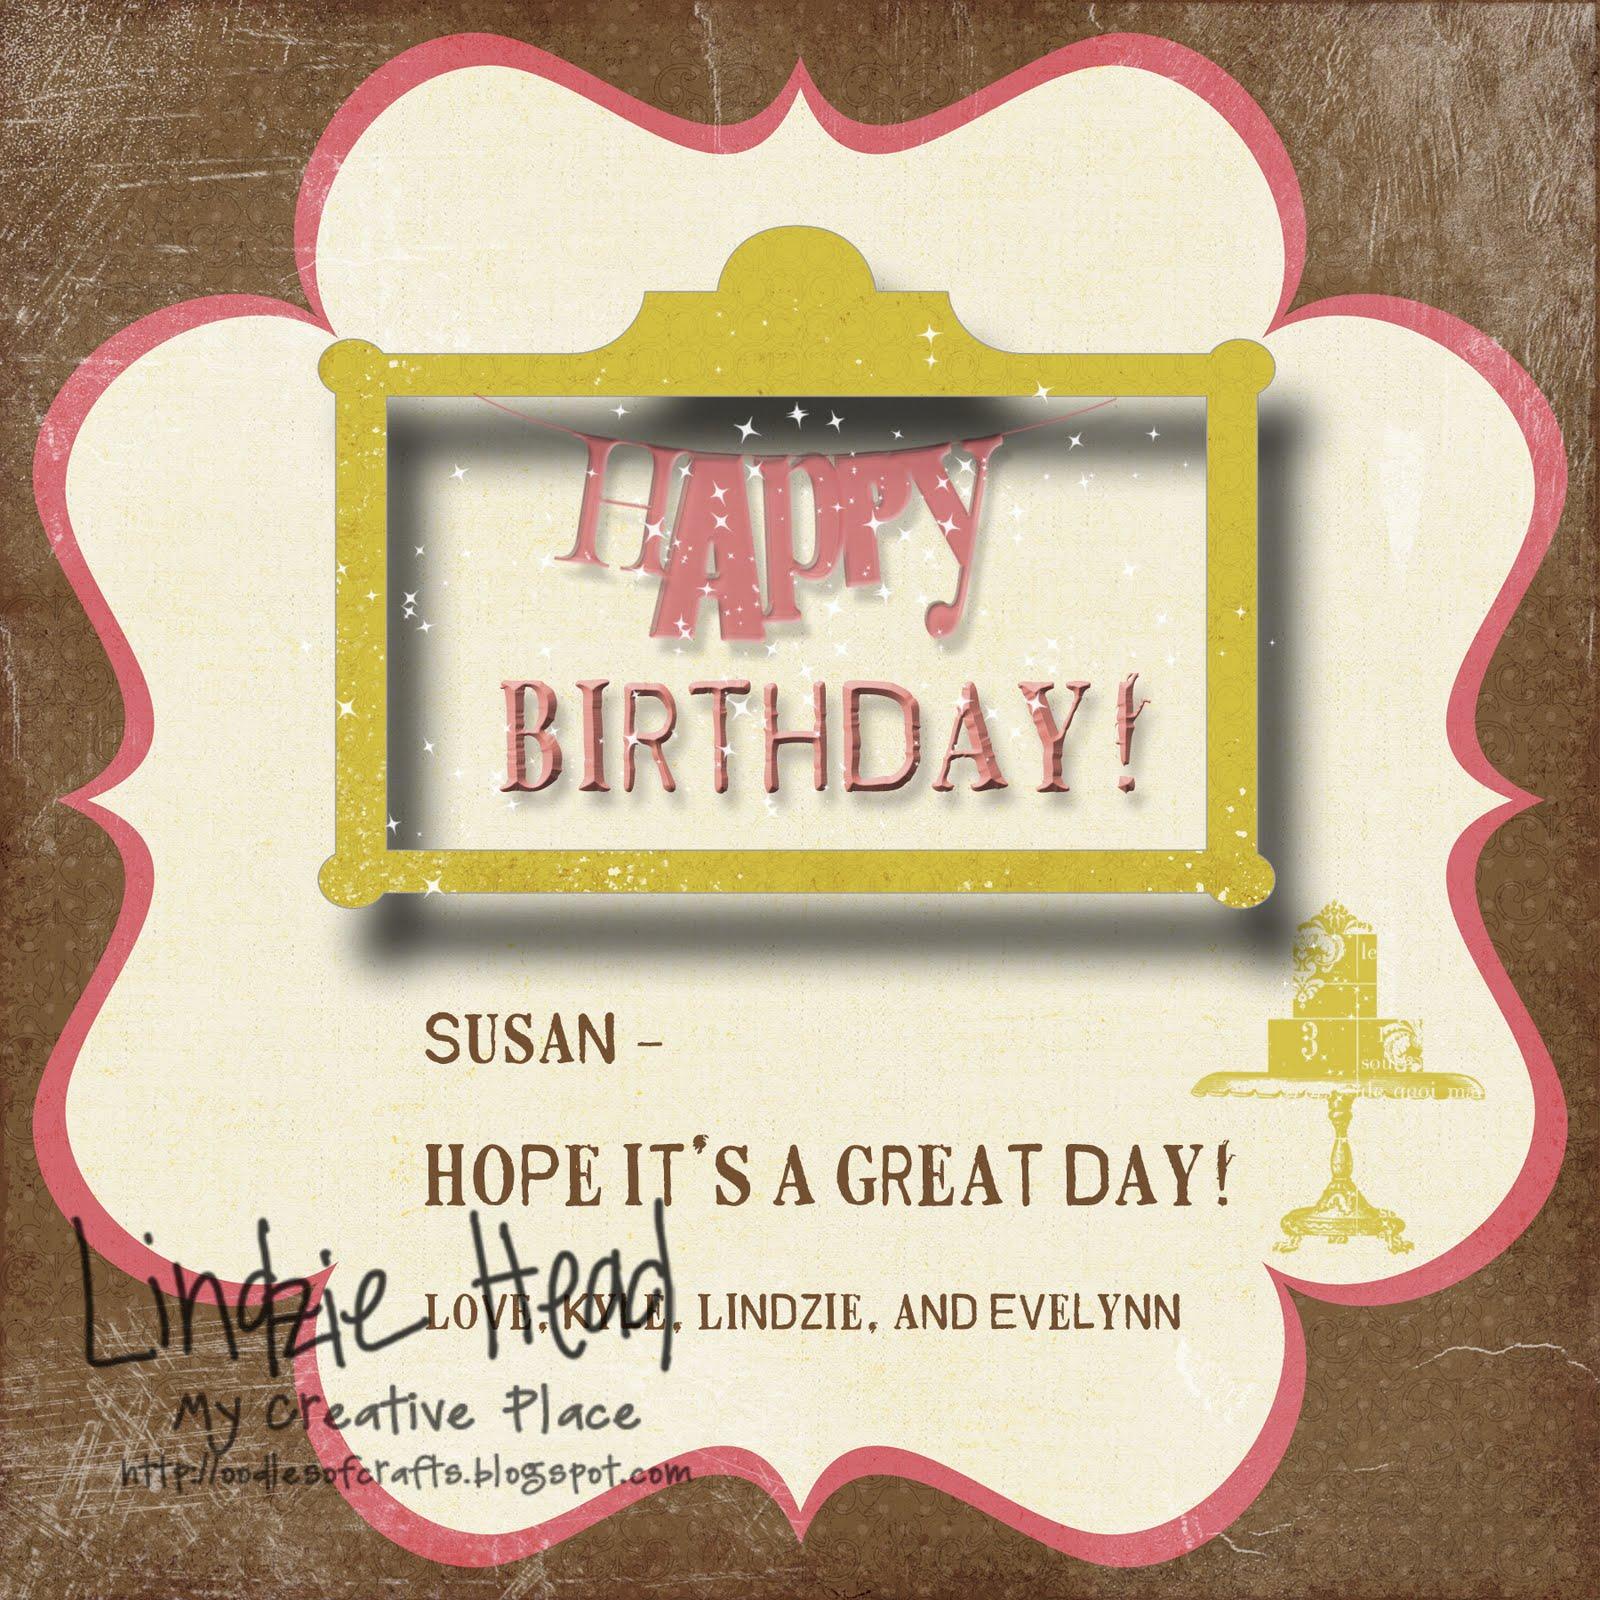 My Creative Place: {Digital} Birthday Cards